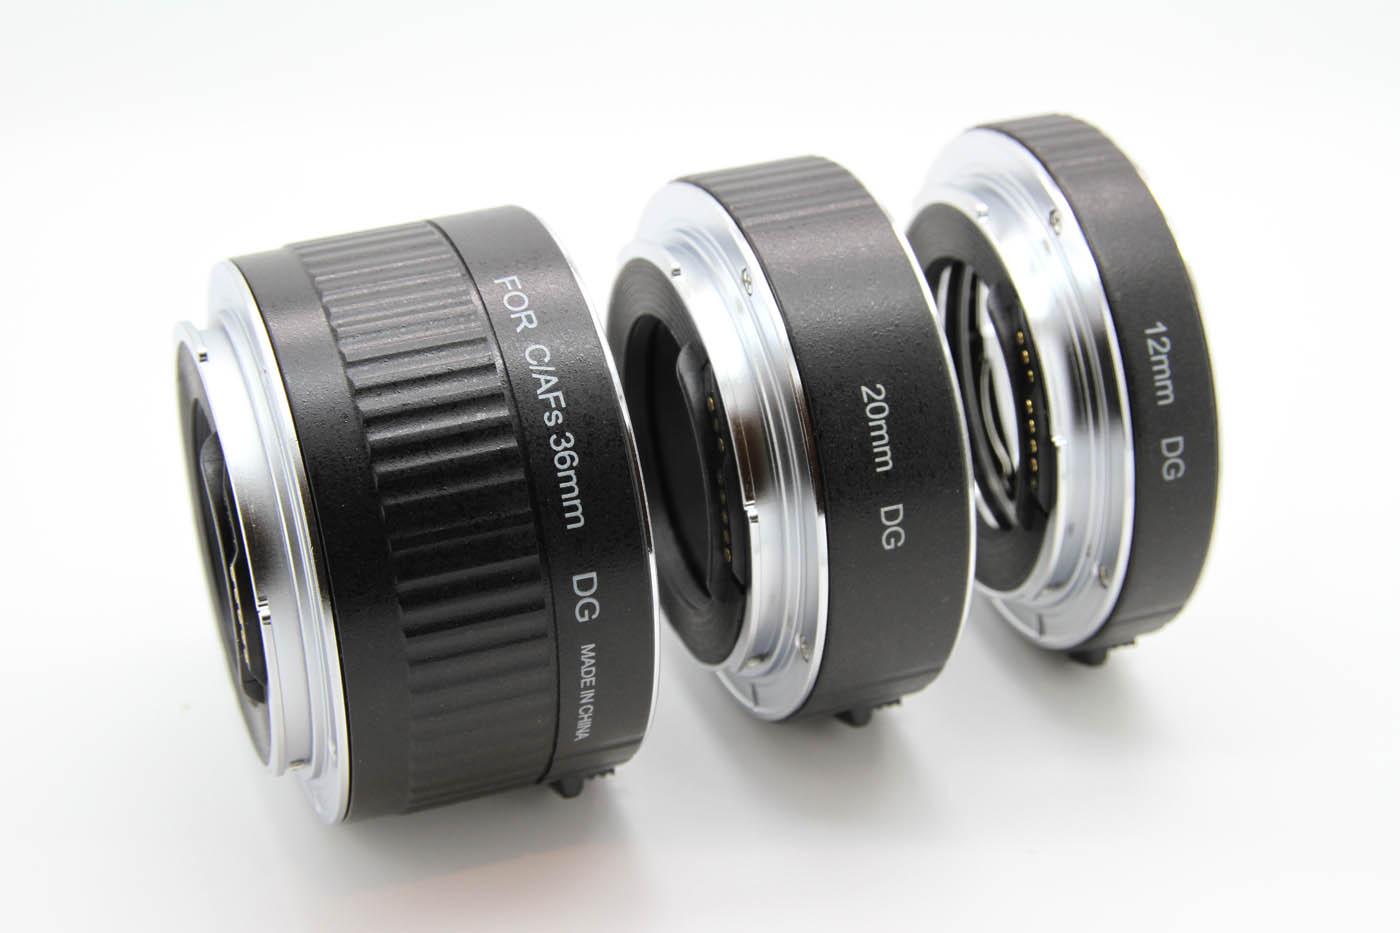 ProTama Auto Focus Macro Extension Tube Set DG-C (For Canon EOS EF/EFS Lens) - 12mm, 20mm, 36mm DG Extension Tube Set